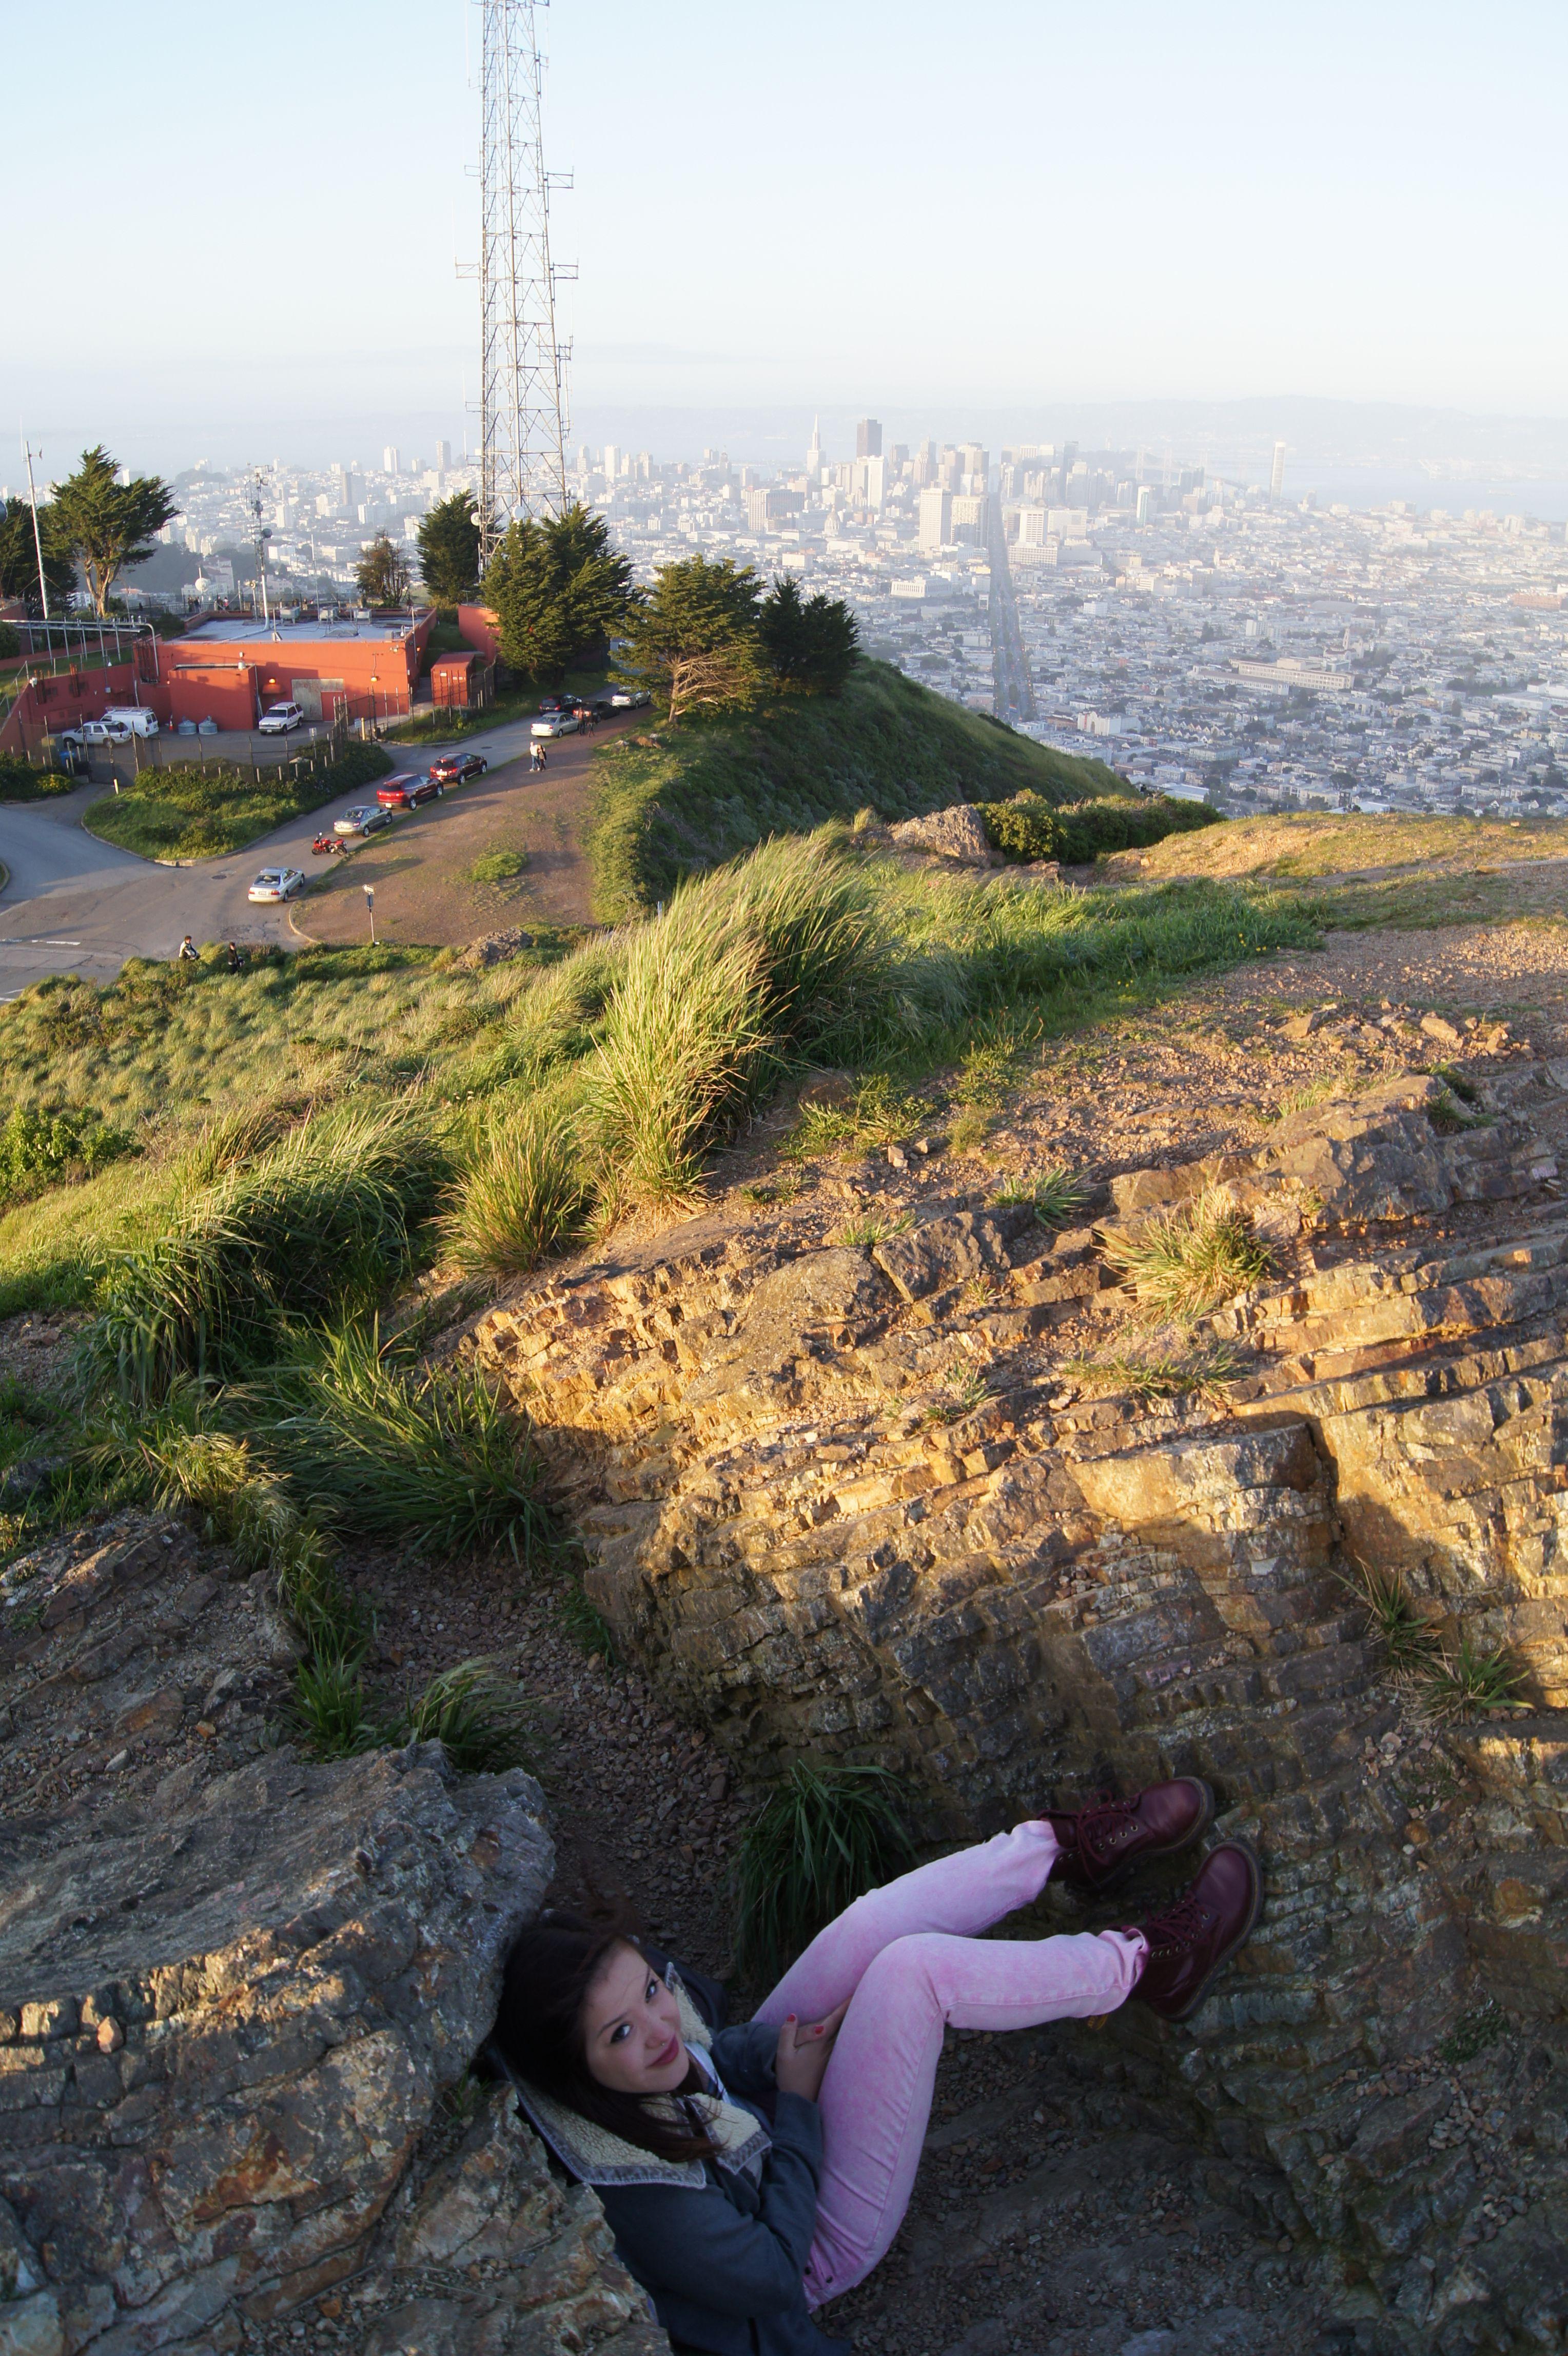 Overlooking beautiful San Francisco, CA.